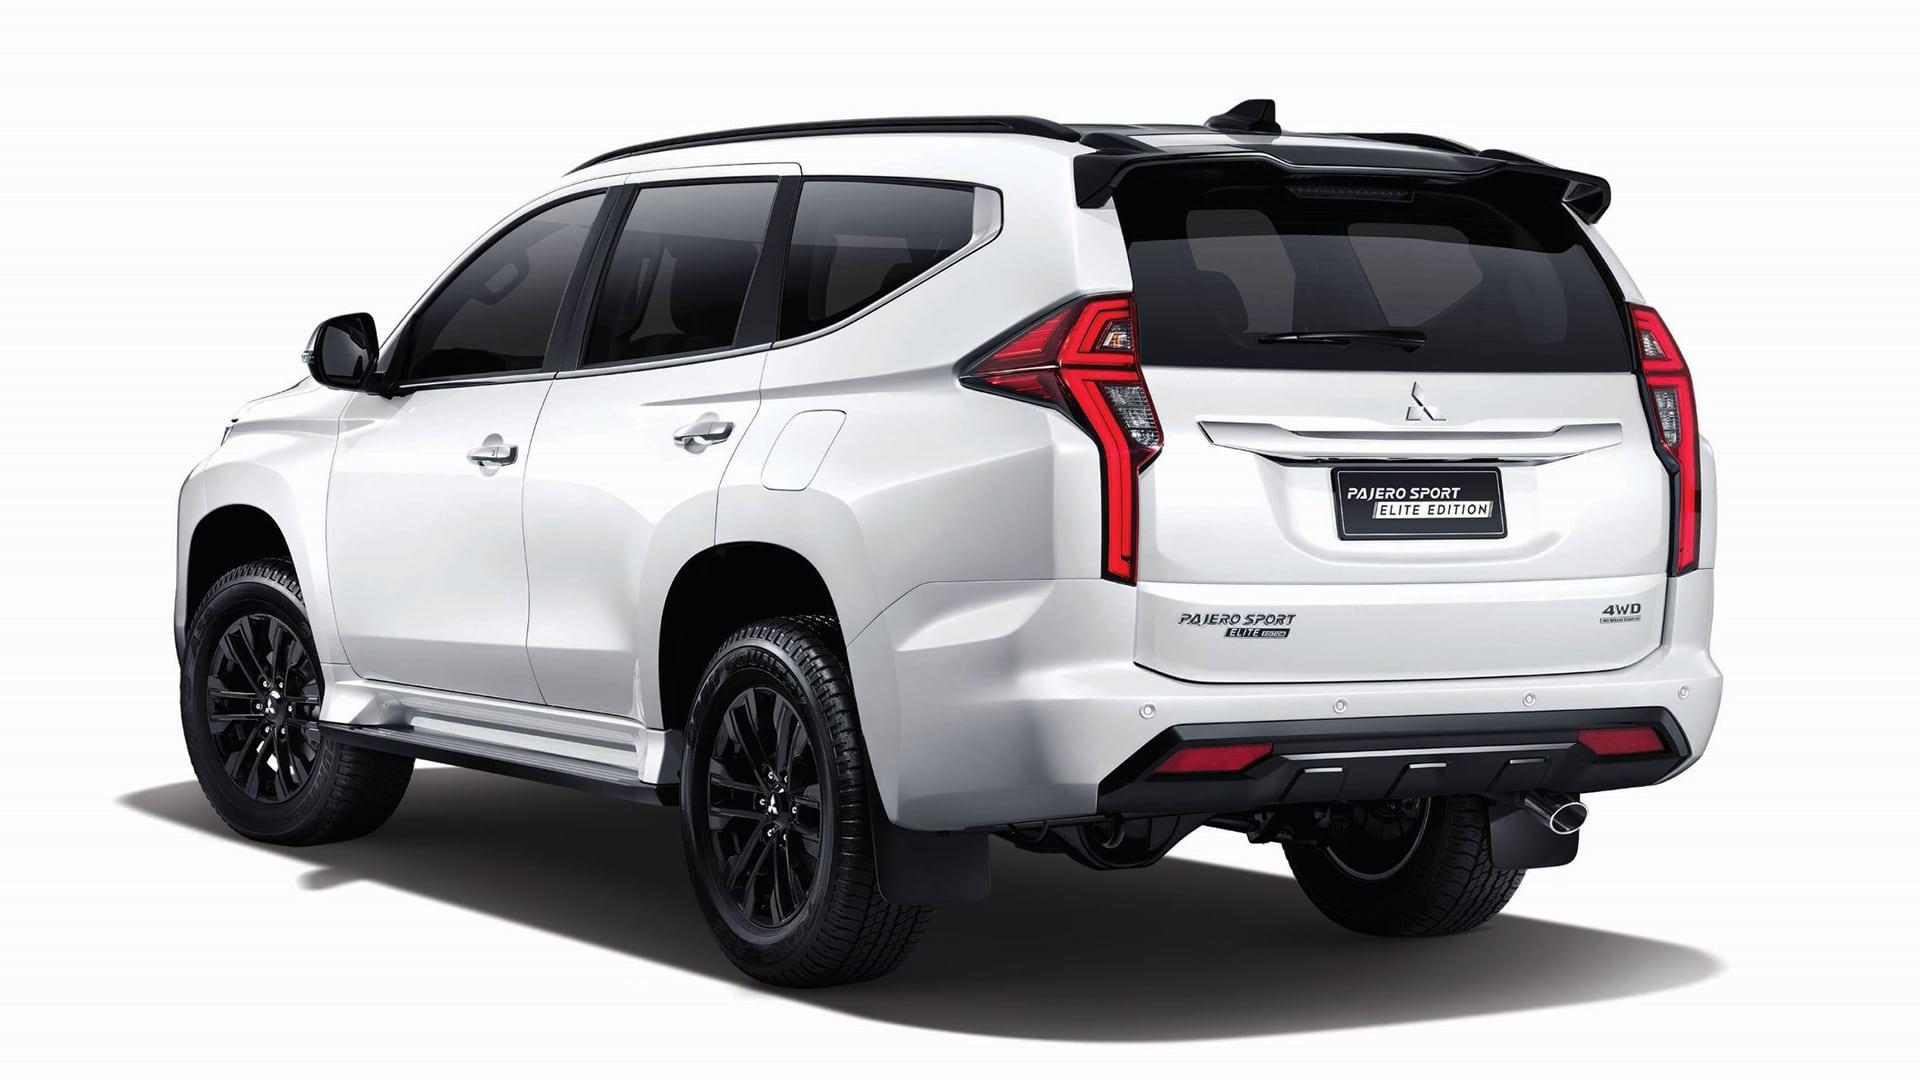 Mitsubishi Pajero Sport Elite Edition 2020